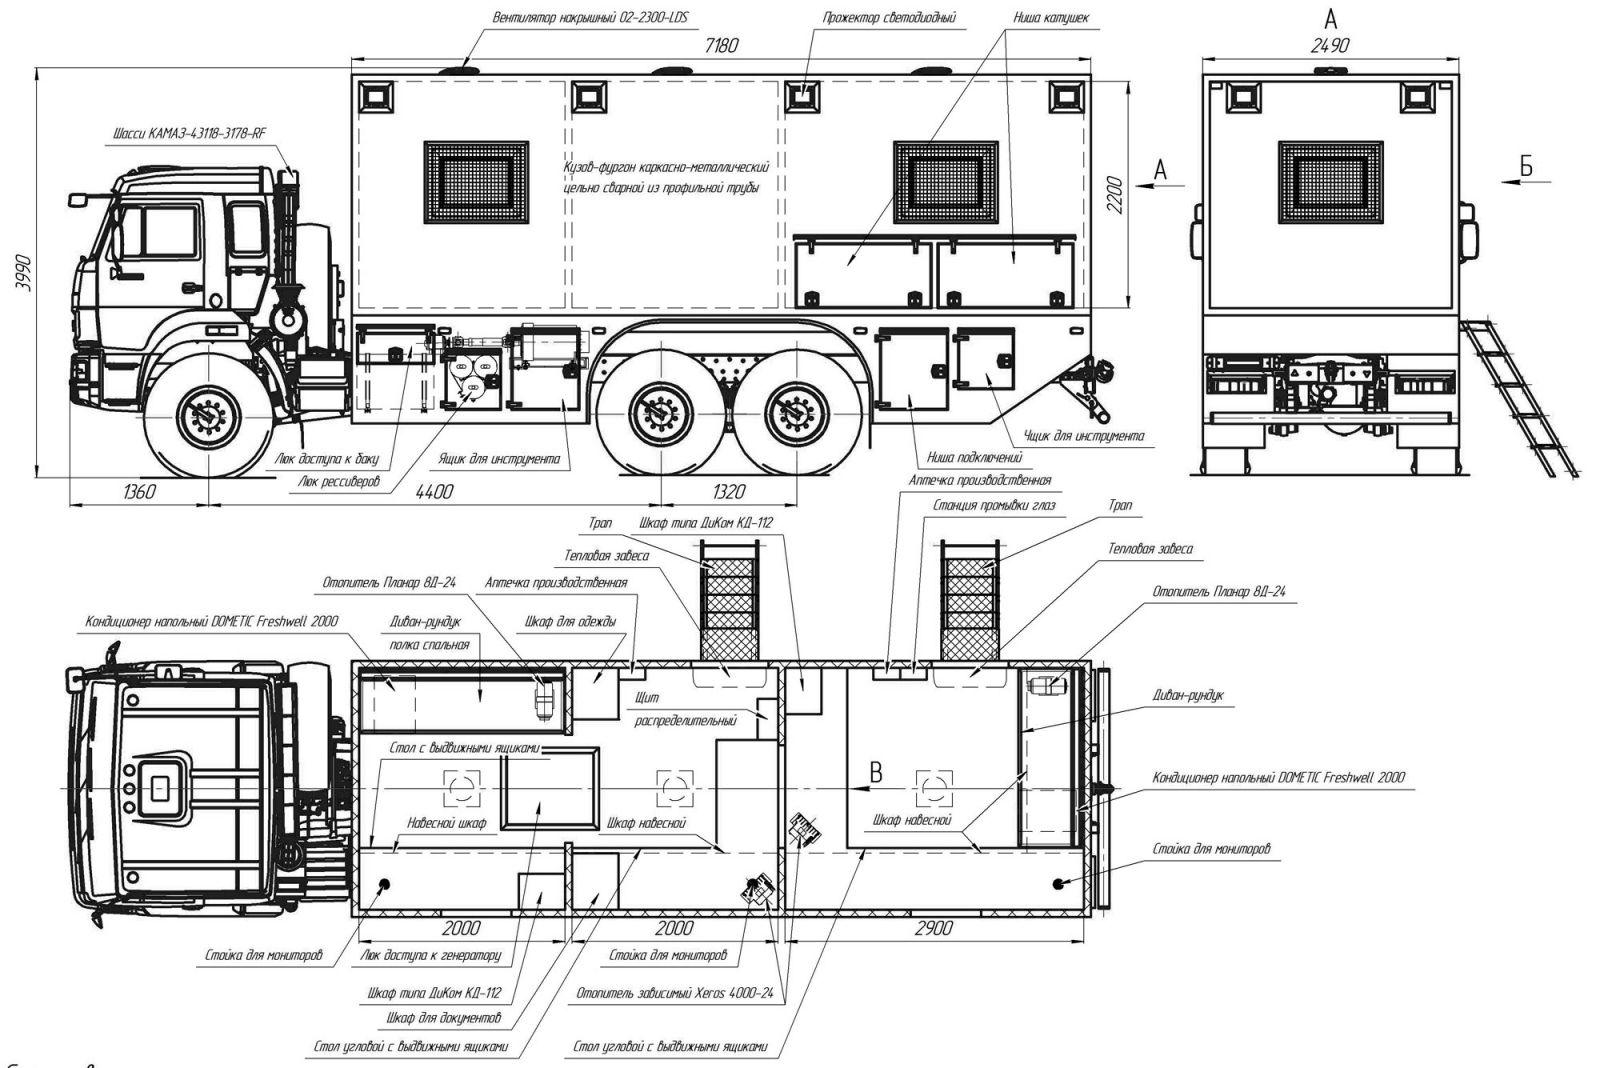 Планировка лаборатории контроля разрыва пластов Камаз 43118-3478-RF